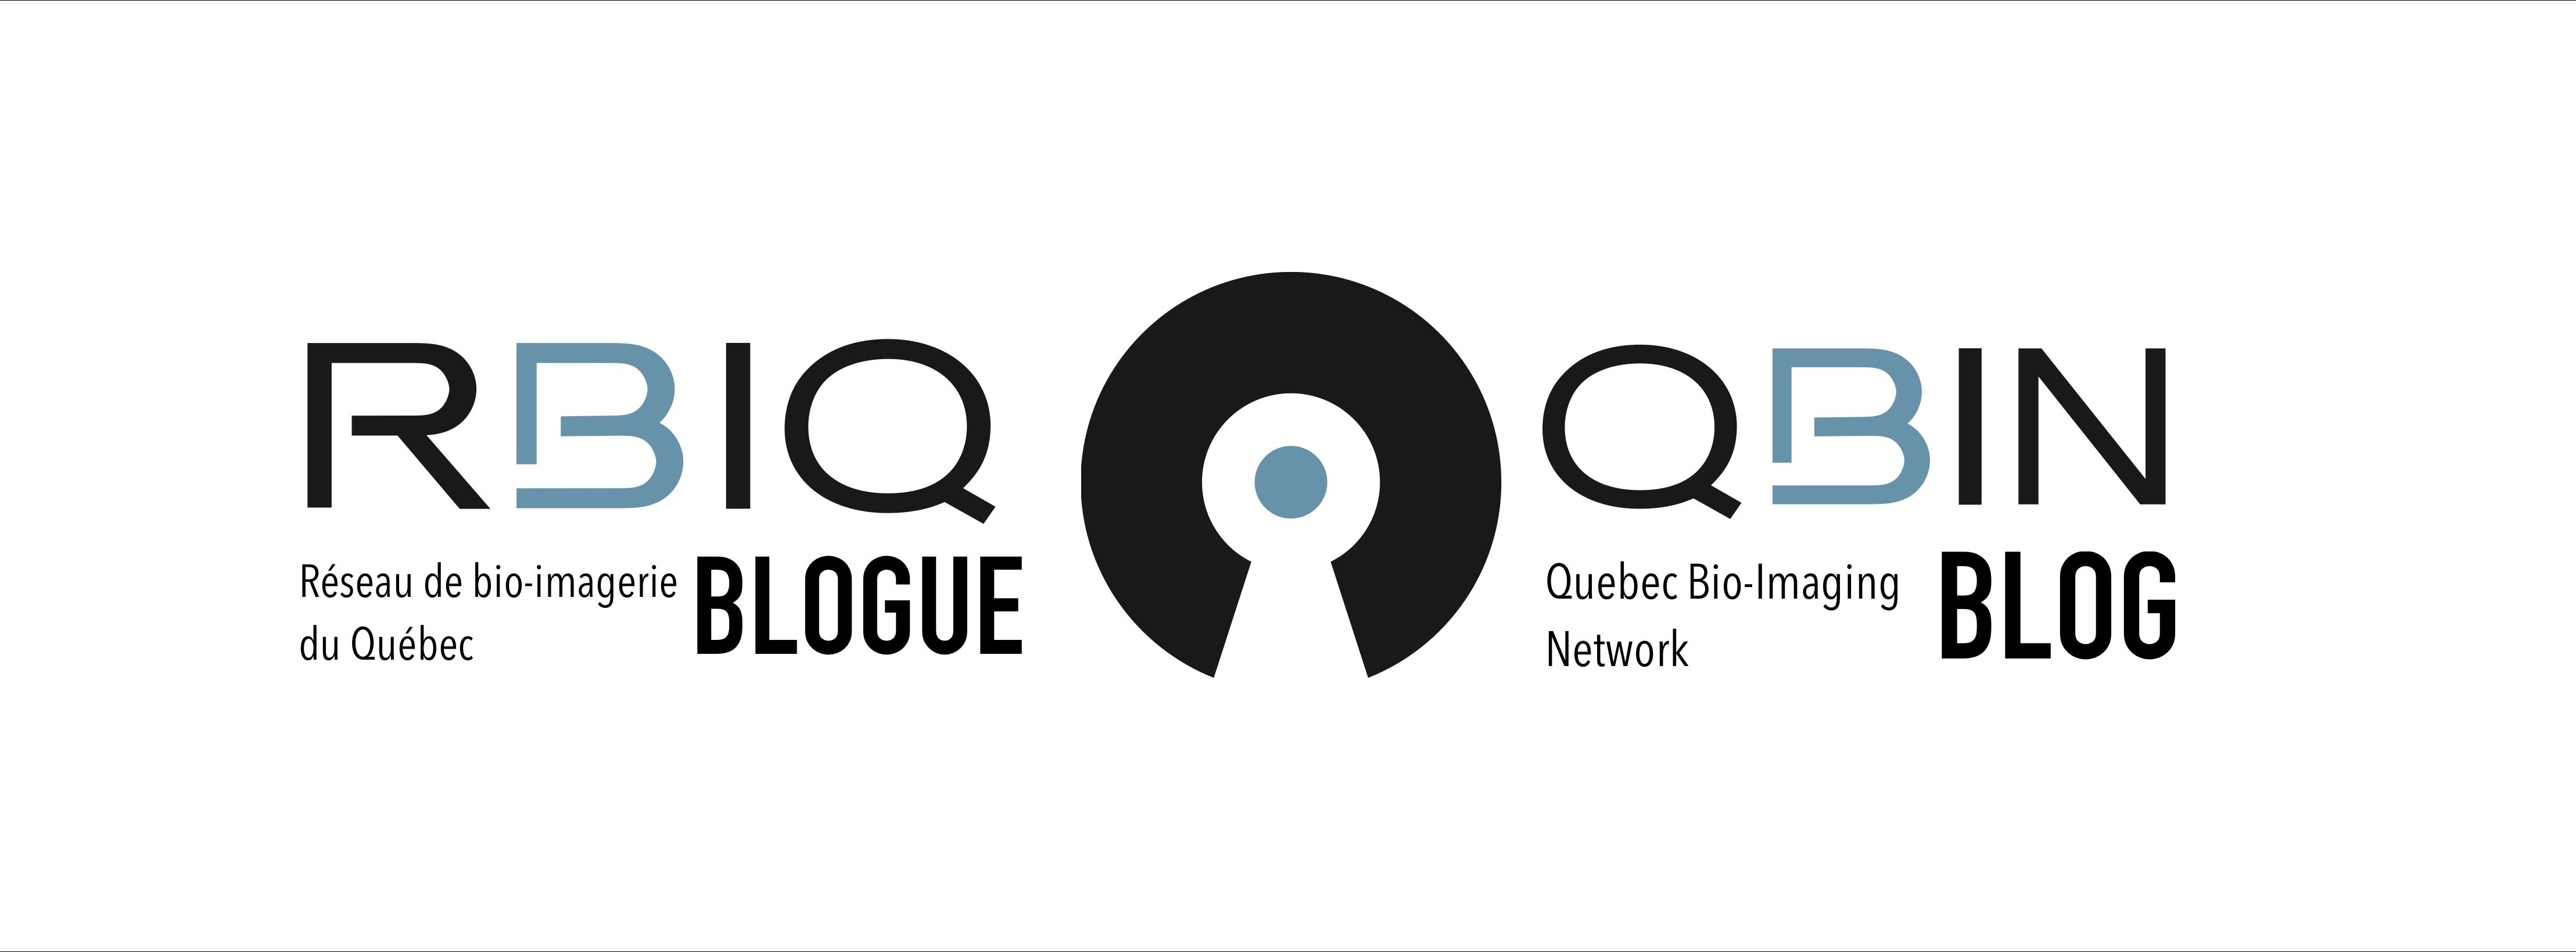 Blogue du RBIQ | QBIN blog